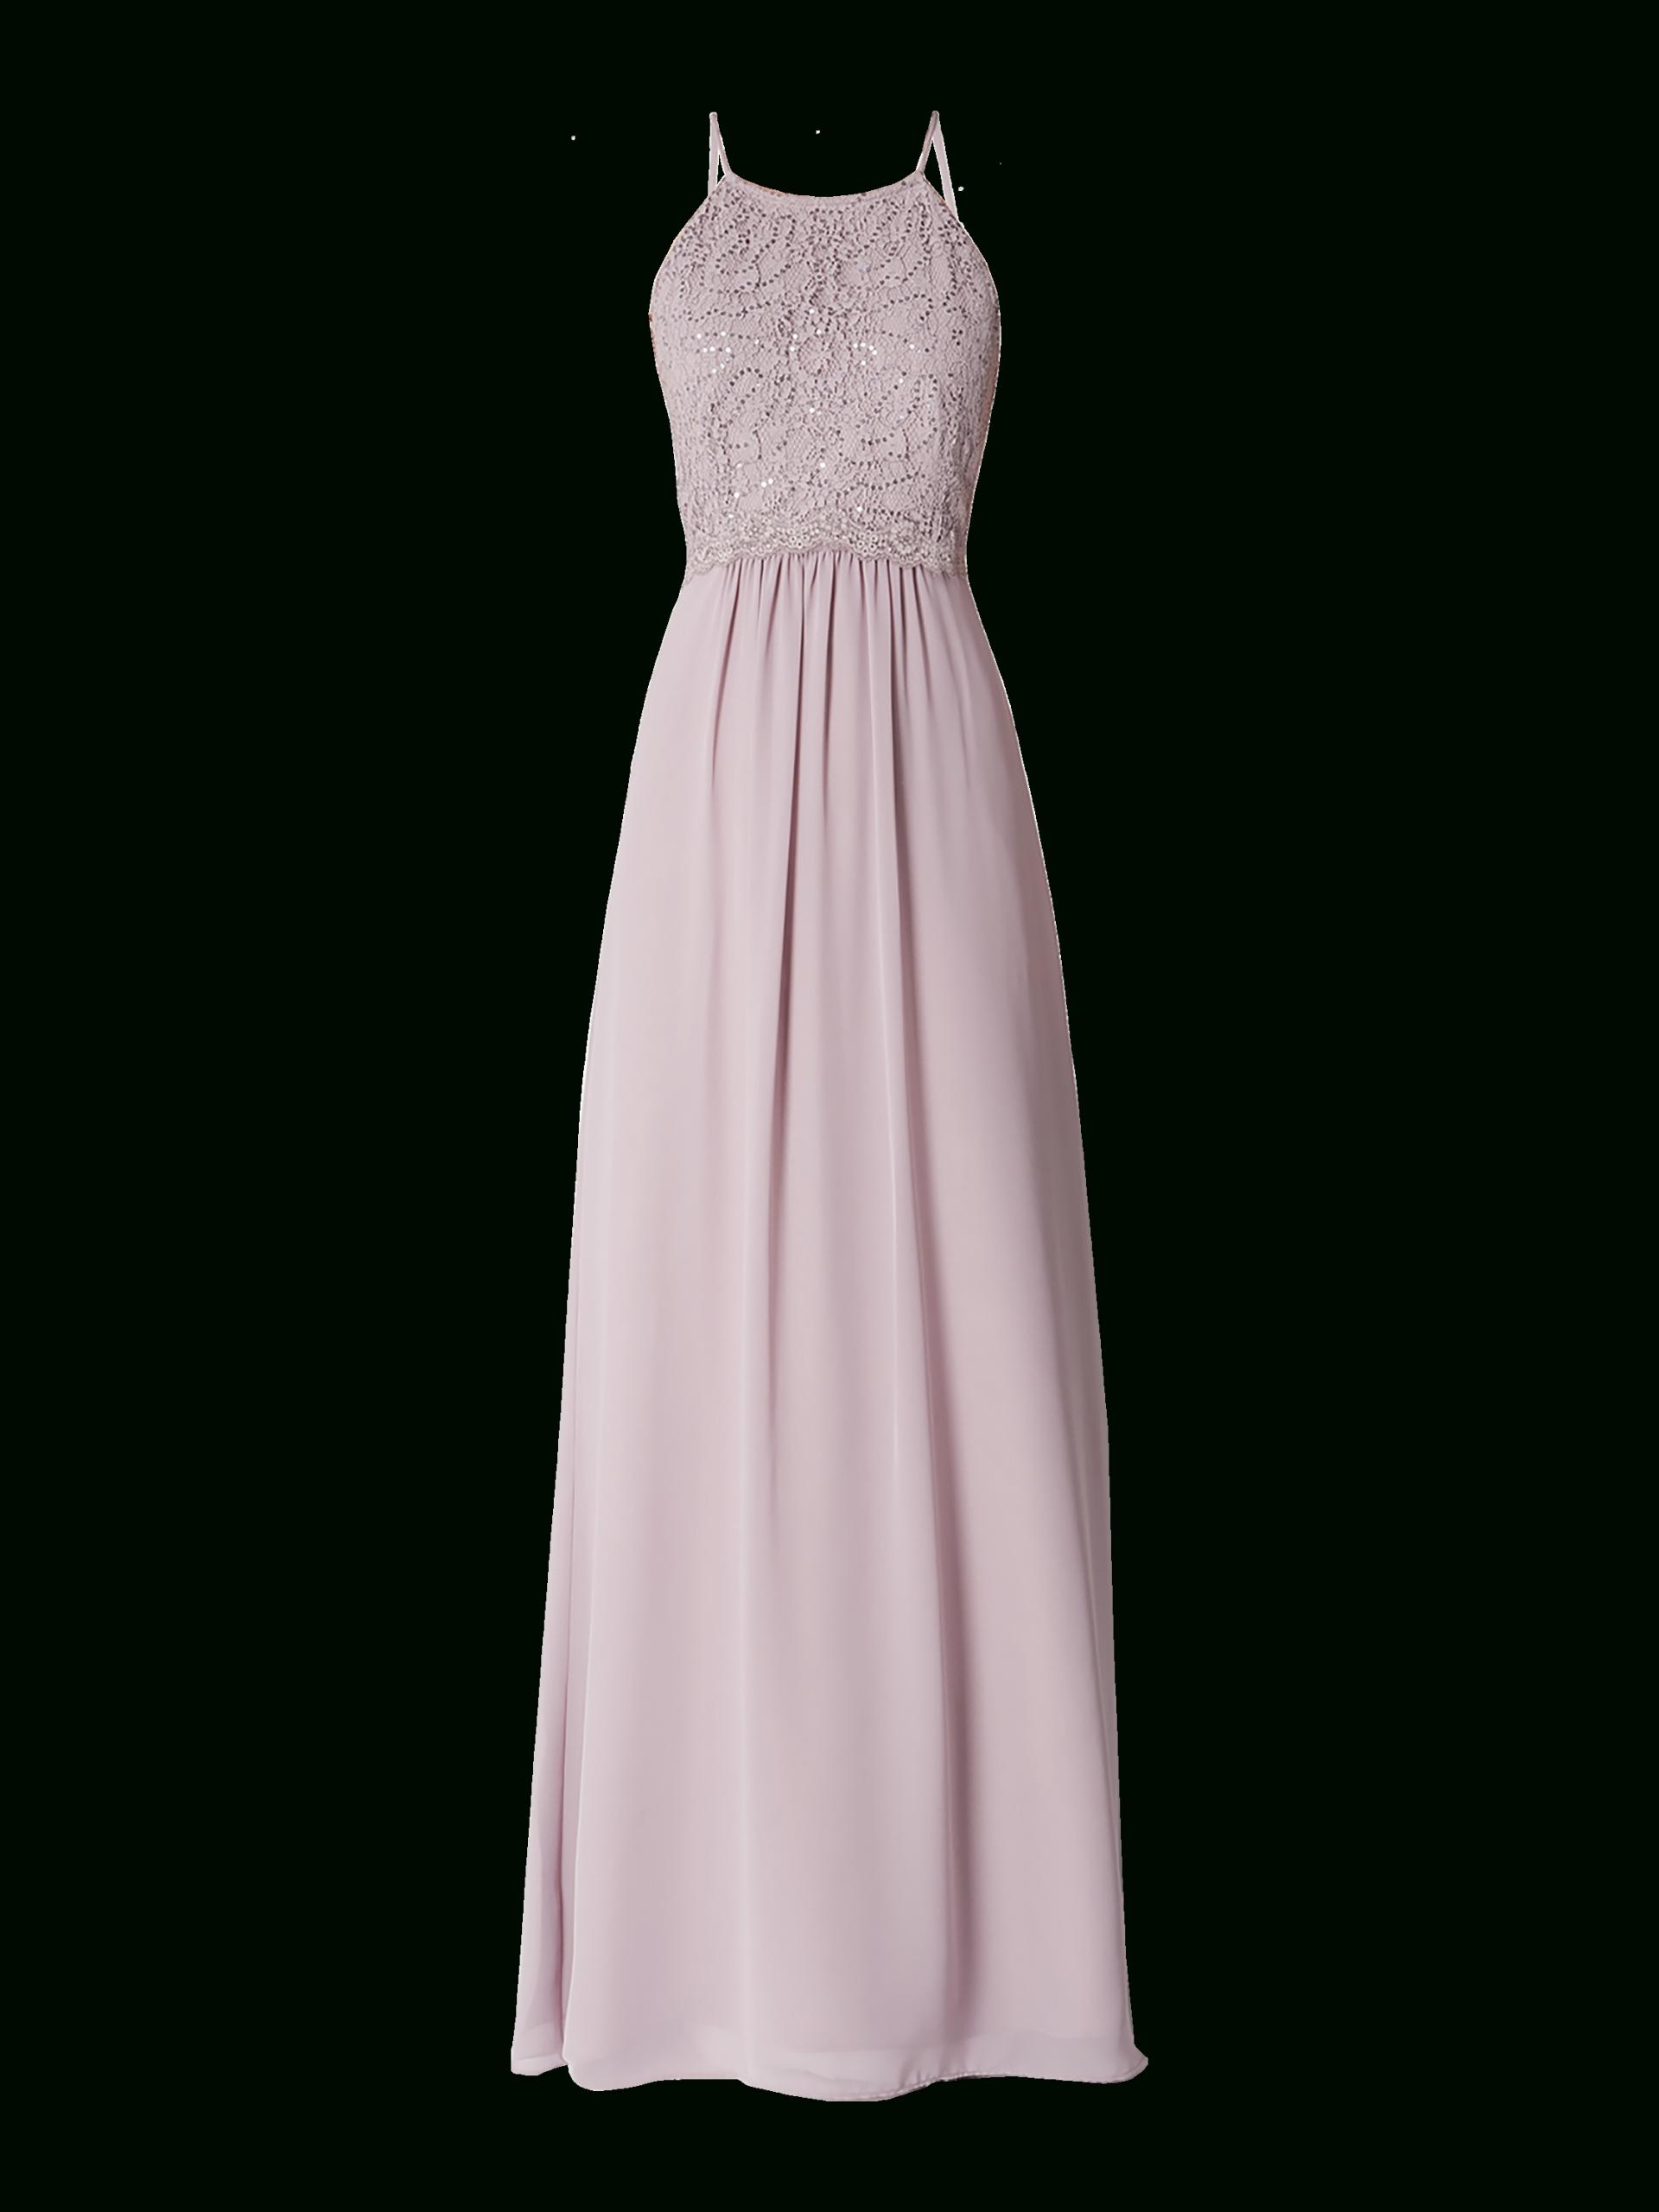 Formal Kreativ Abendkleid Kürzen Preis Stylish10 Genial Abendkleid Kürzen Preis Vertrieb